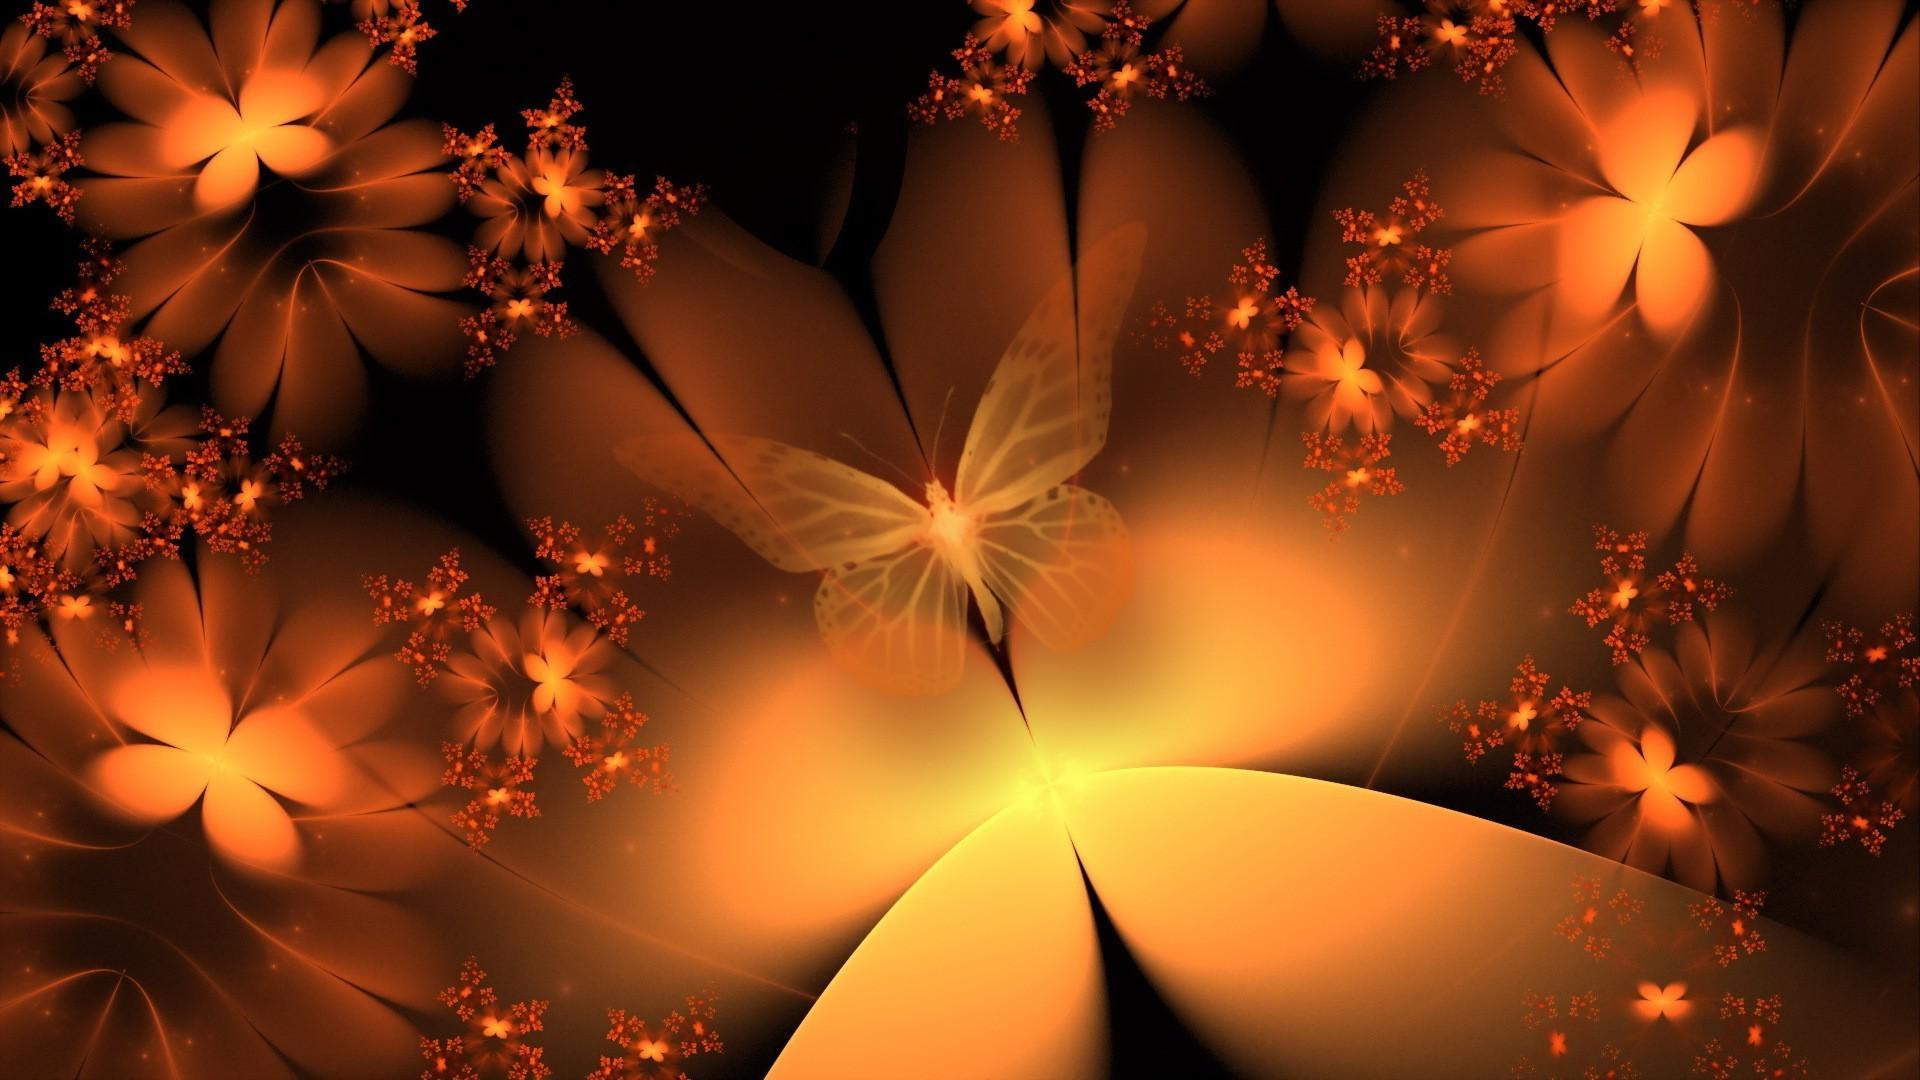 Открытки с мерцающим фоном, картинки бабочки